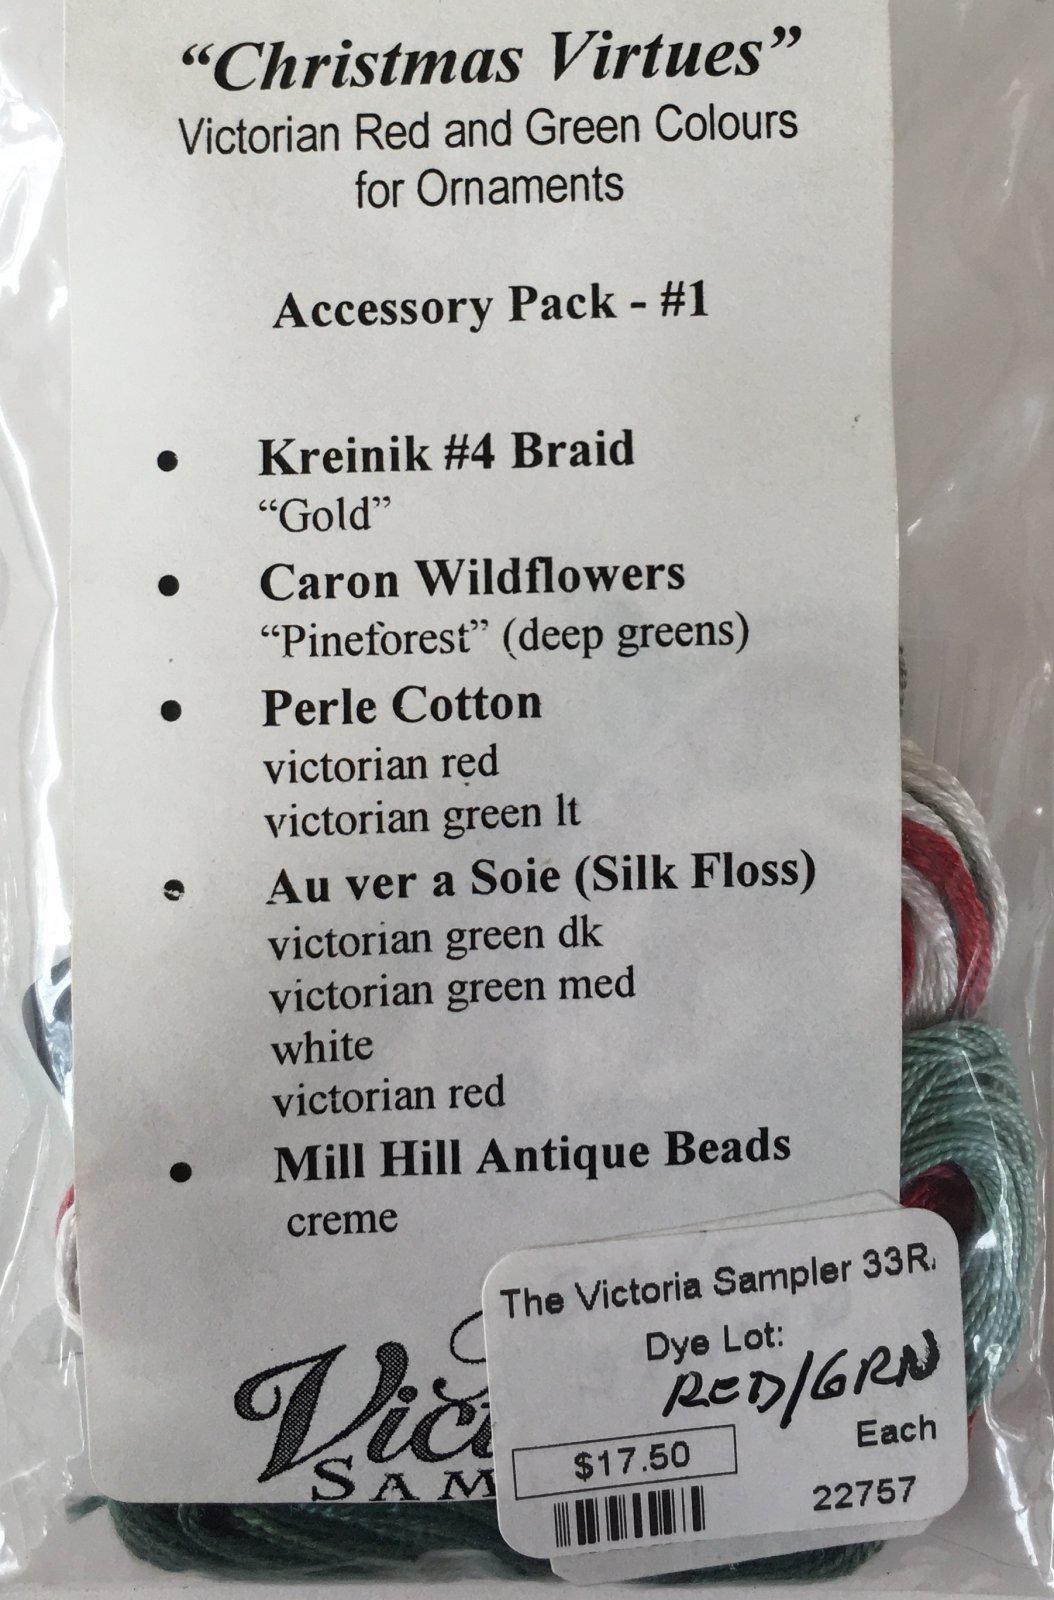 The Victoria Sampler 33 #1 AP